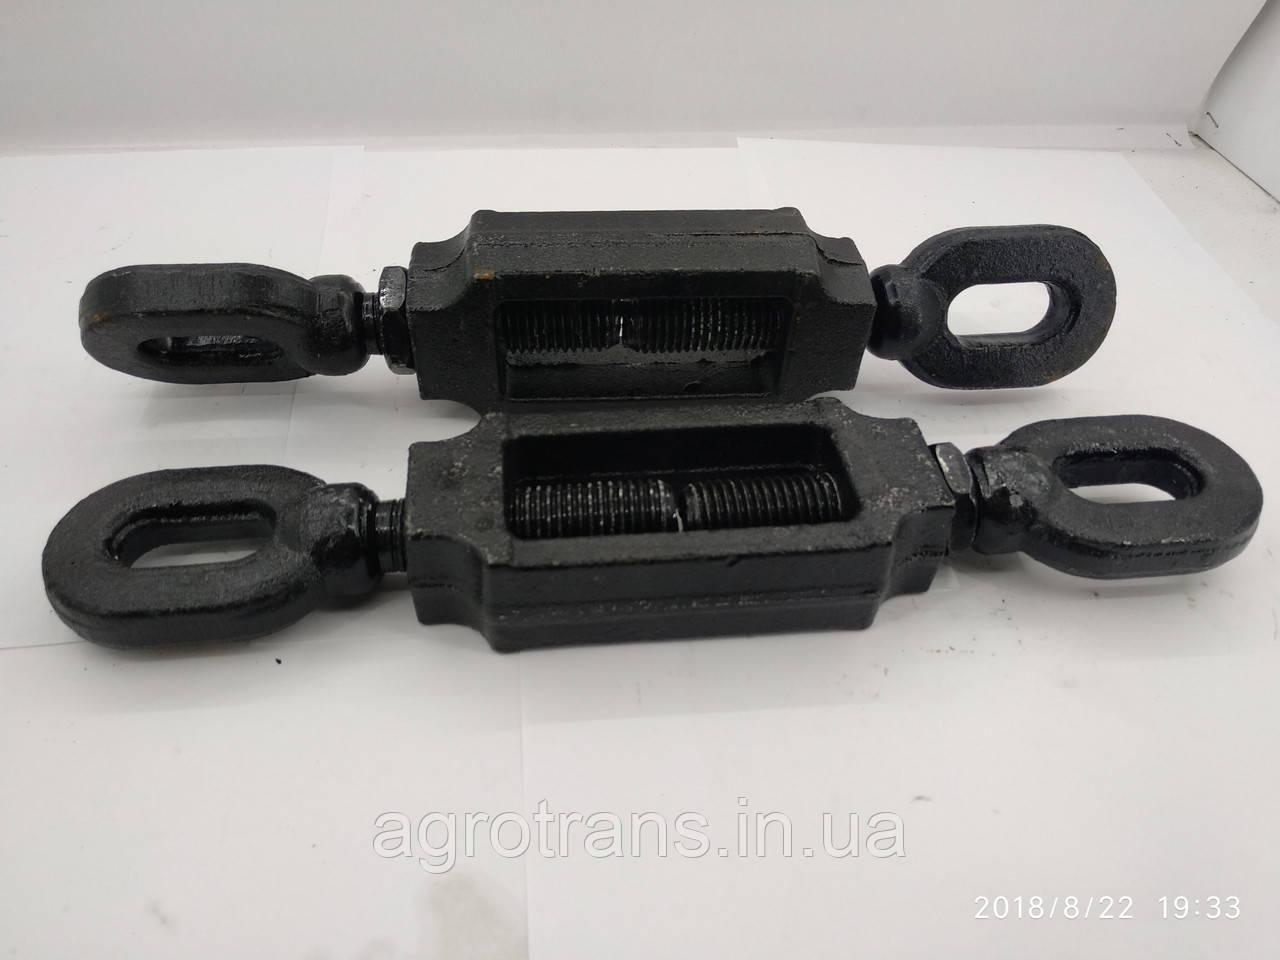 Стяжка механизма задней навески МТЗ 1221 (можно как усиленный вариант на МТЗ 892 и выше) СУПЕР цена!